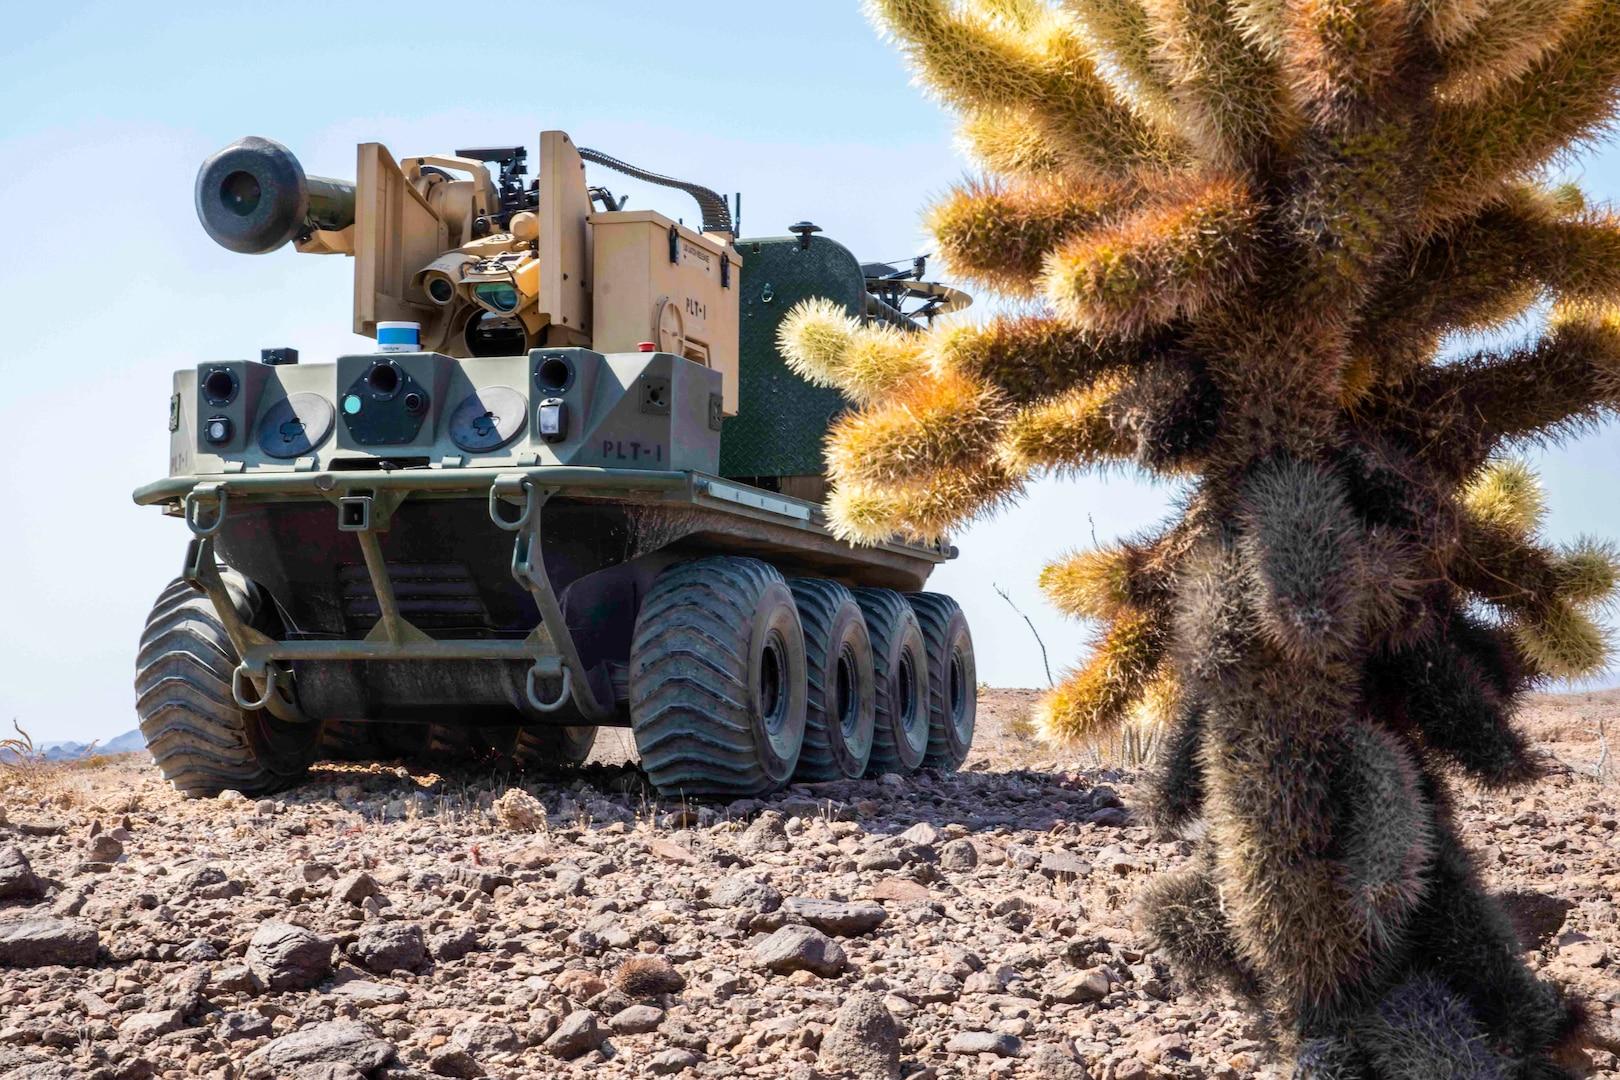 Autonomous system Origin prepares for practice run on August 20, 2020, during Project Convergence capstone event at Yuma Proving Ground, Arizona (U.S. Army/Carlos Cuebas Fantauzzi)